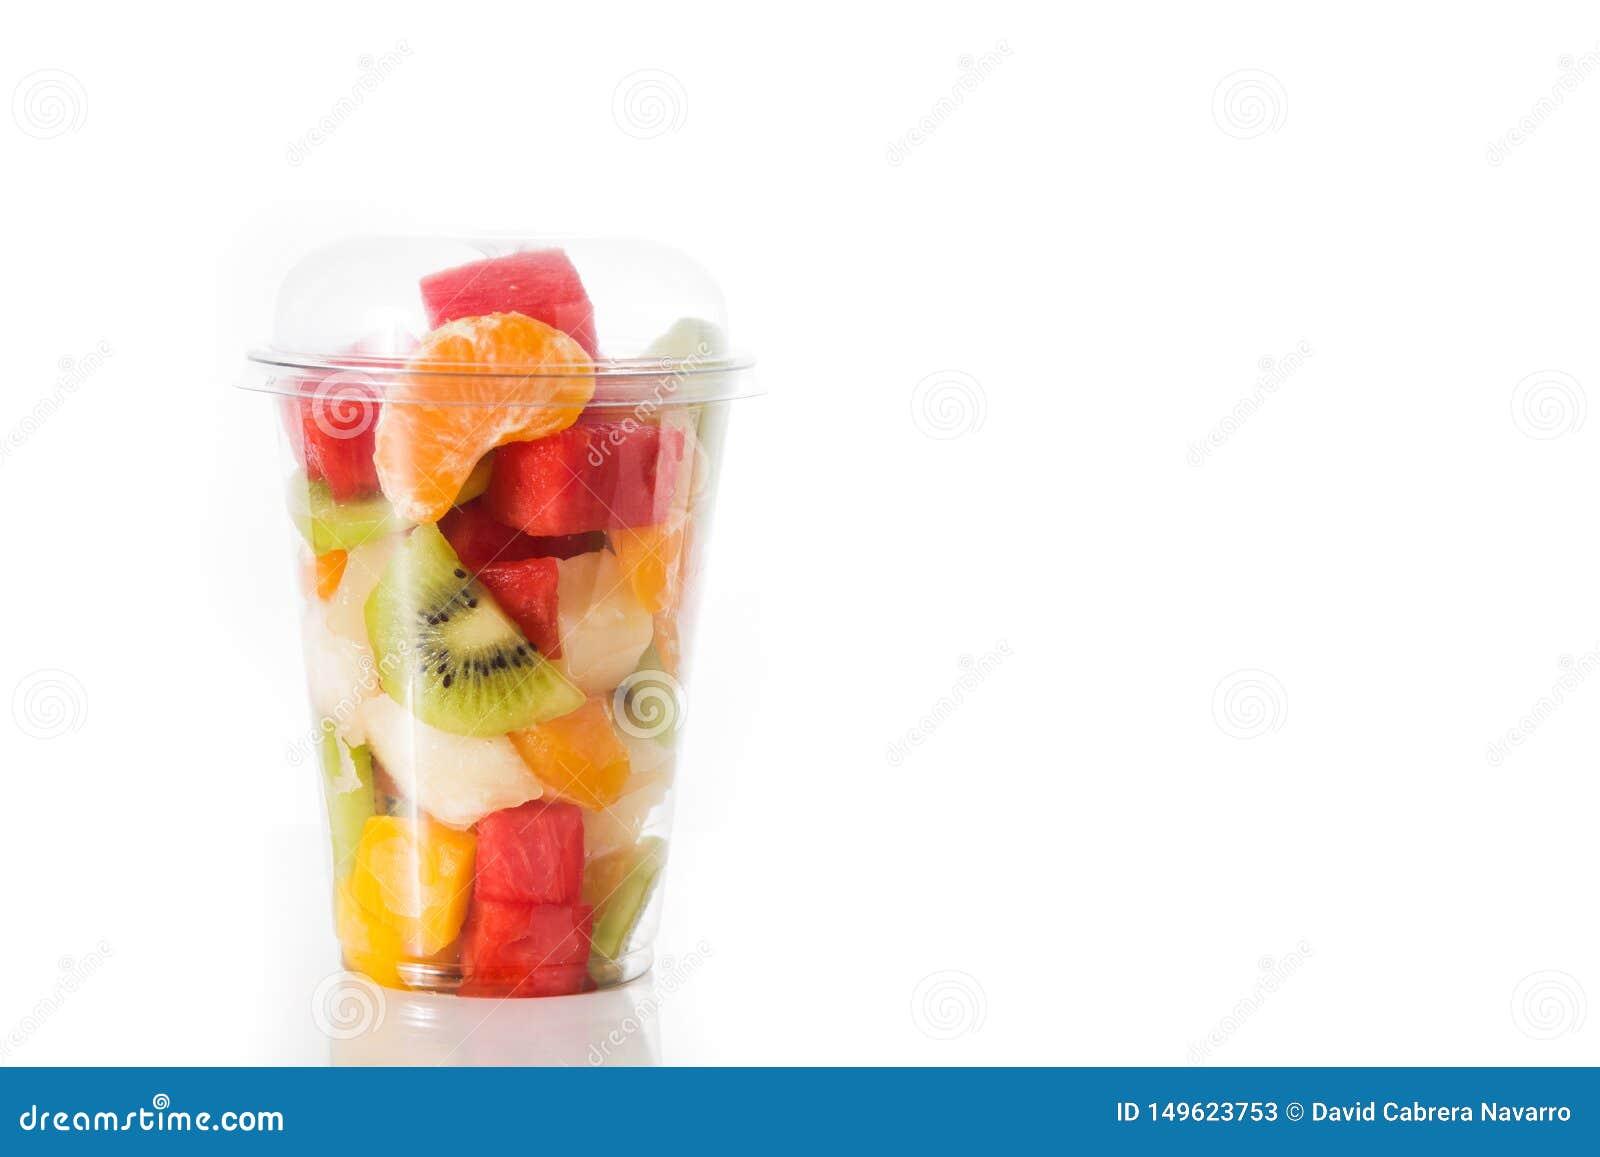 Fresh cut fruit in a plastic cup